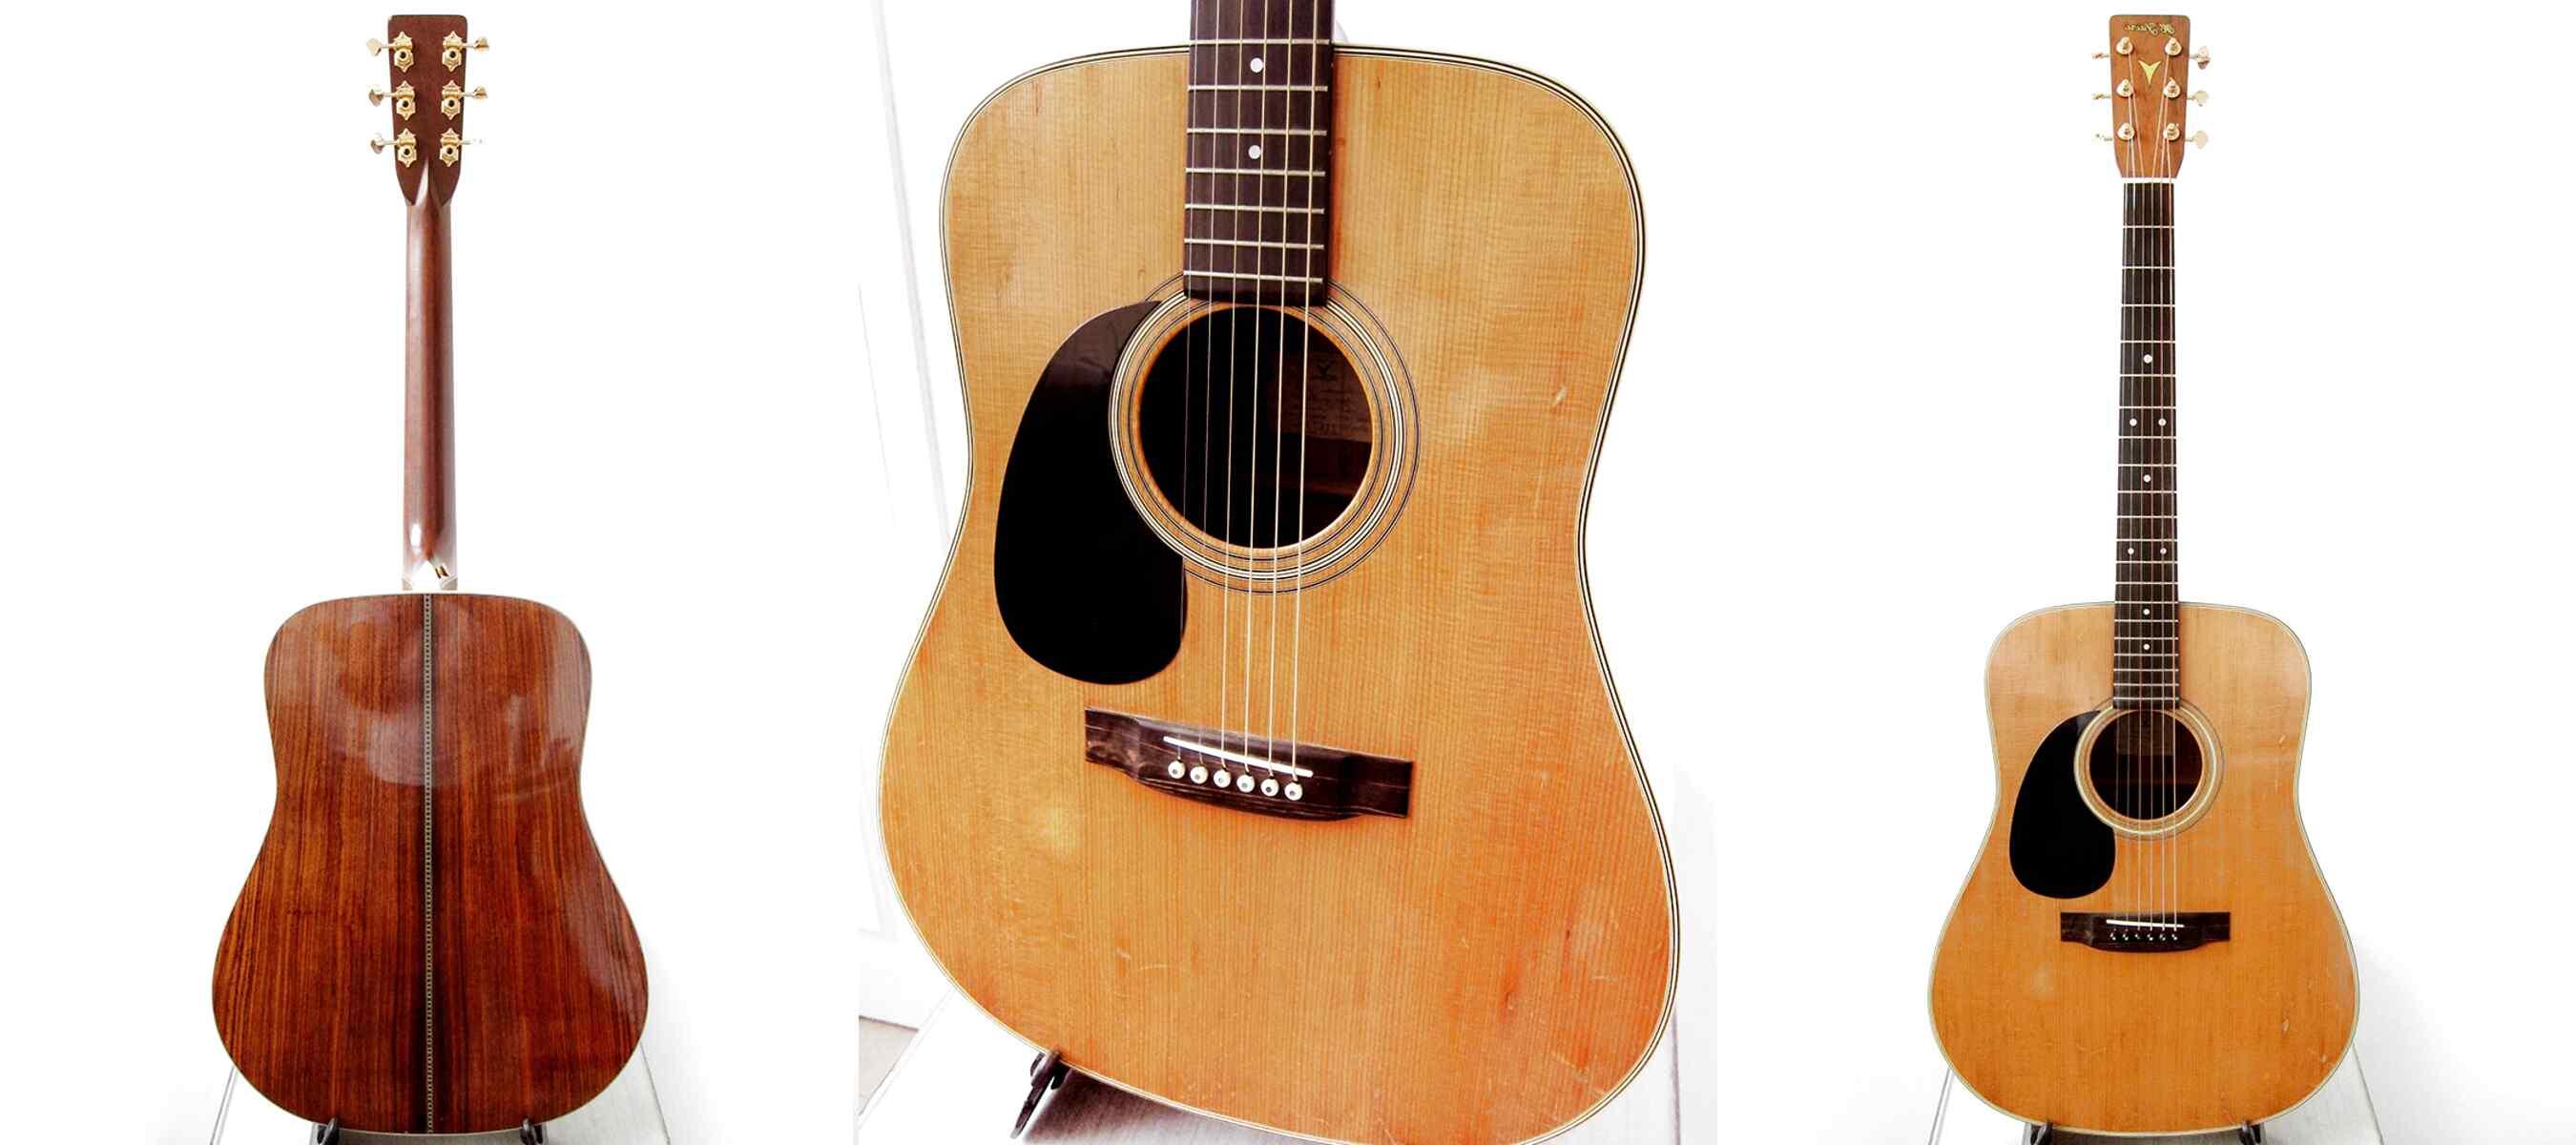 k yairi guitars for sale